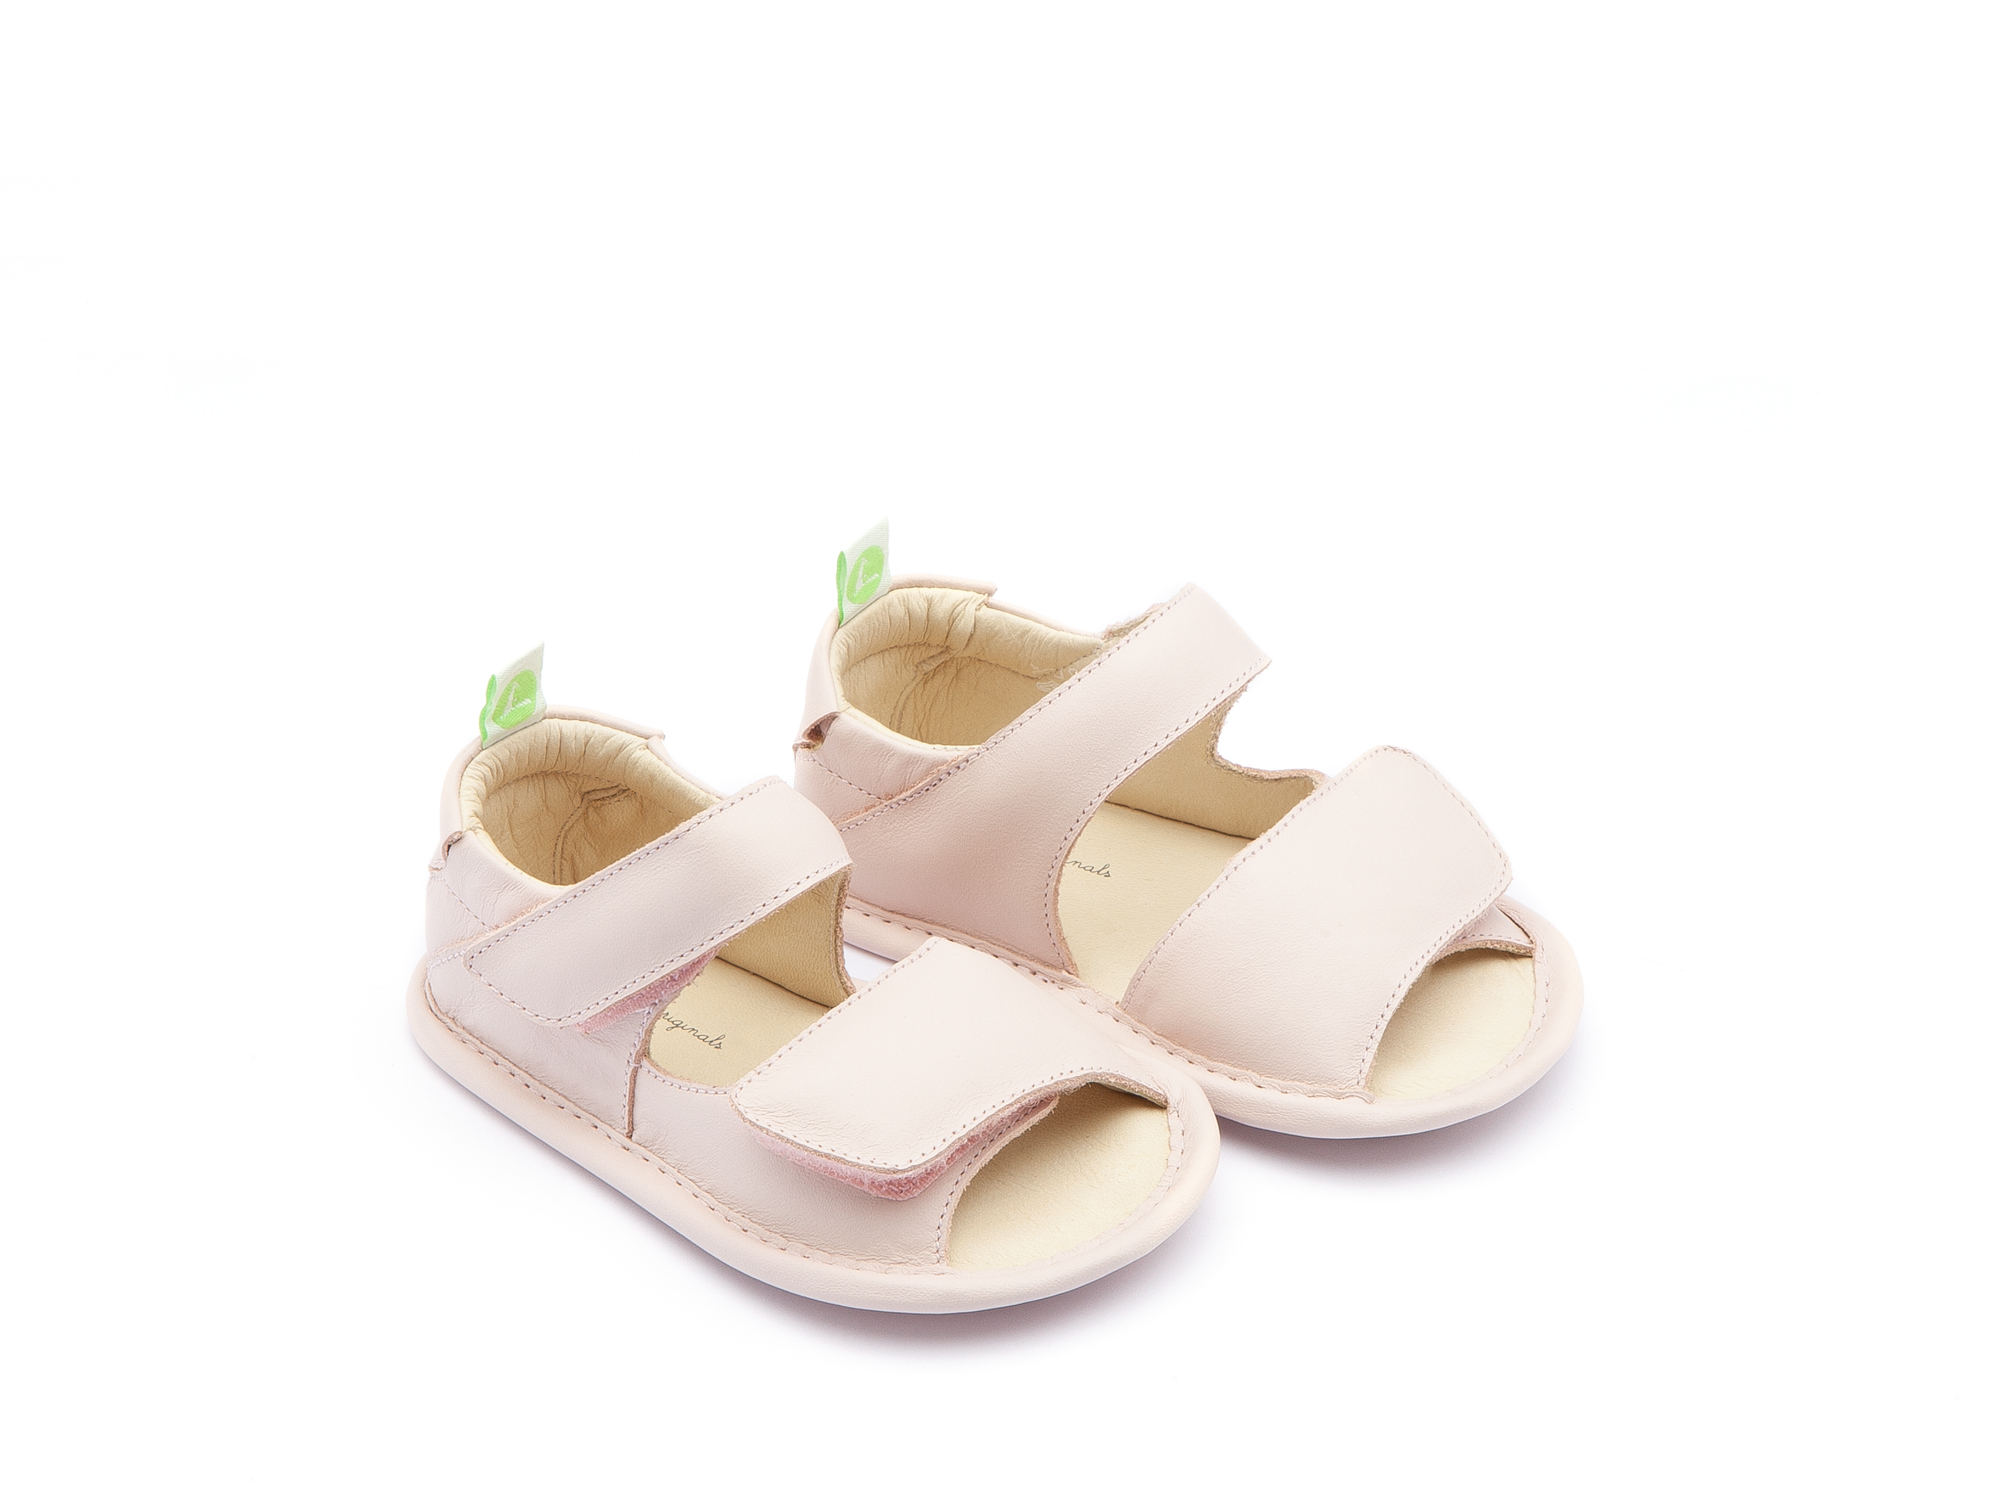 Sandália Toey Cotton Candy Baby 0 à 2 anos - 0